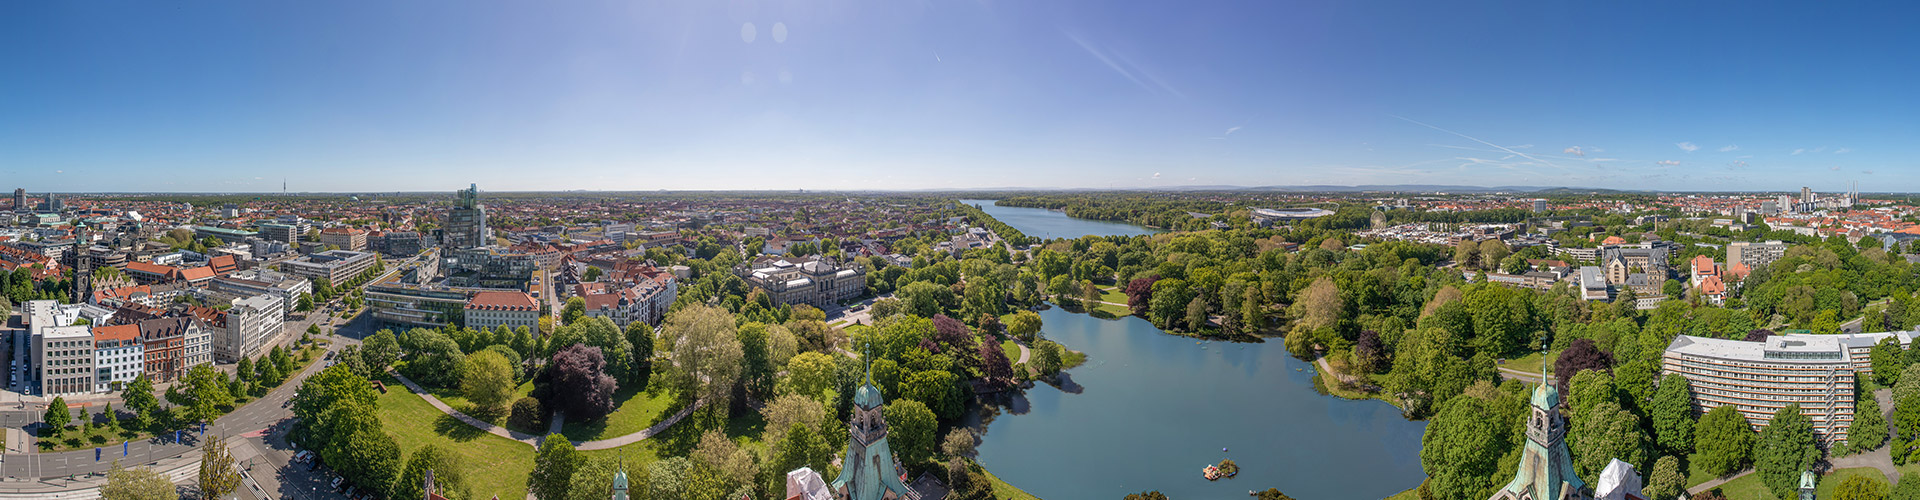 panorama of hanover